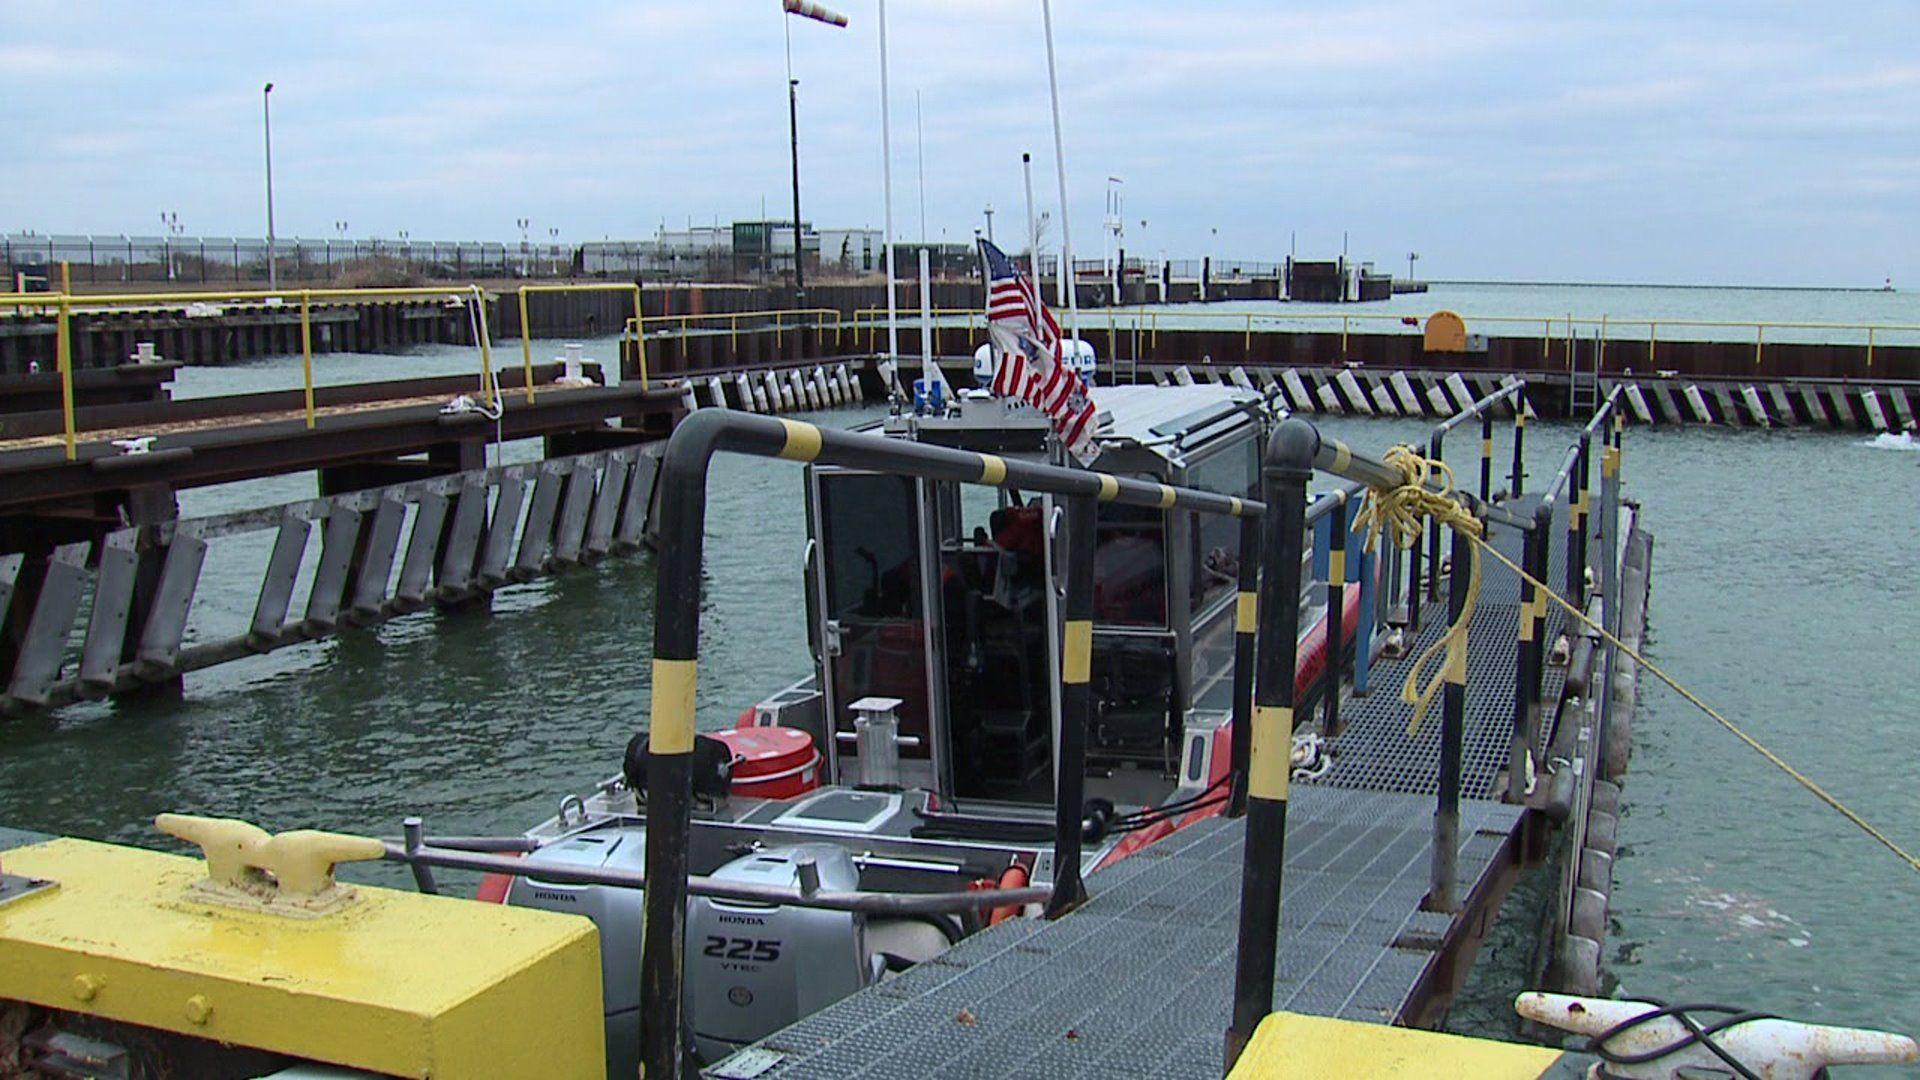 Coast Guard's Members Miss Paychecks Due To Shutdown, Get $15 Million Donation